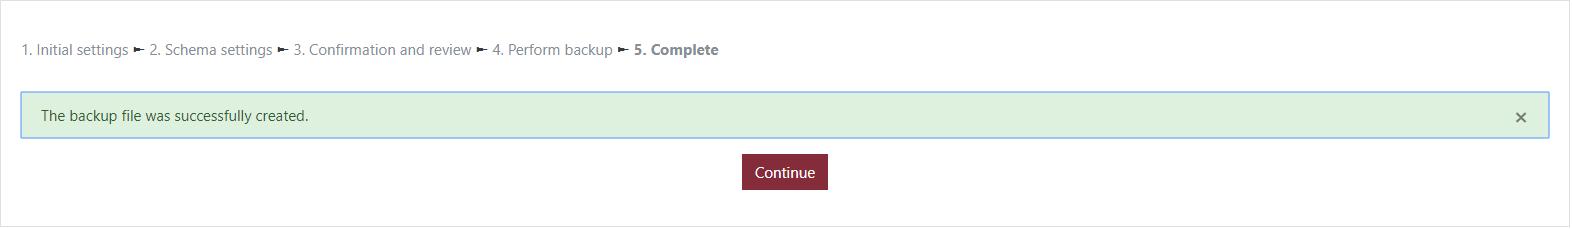 Image: Continue button